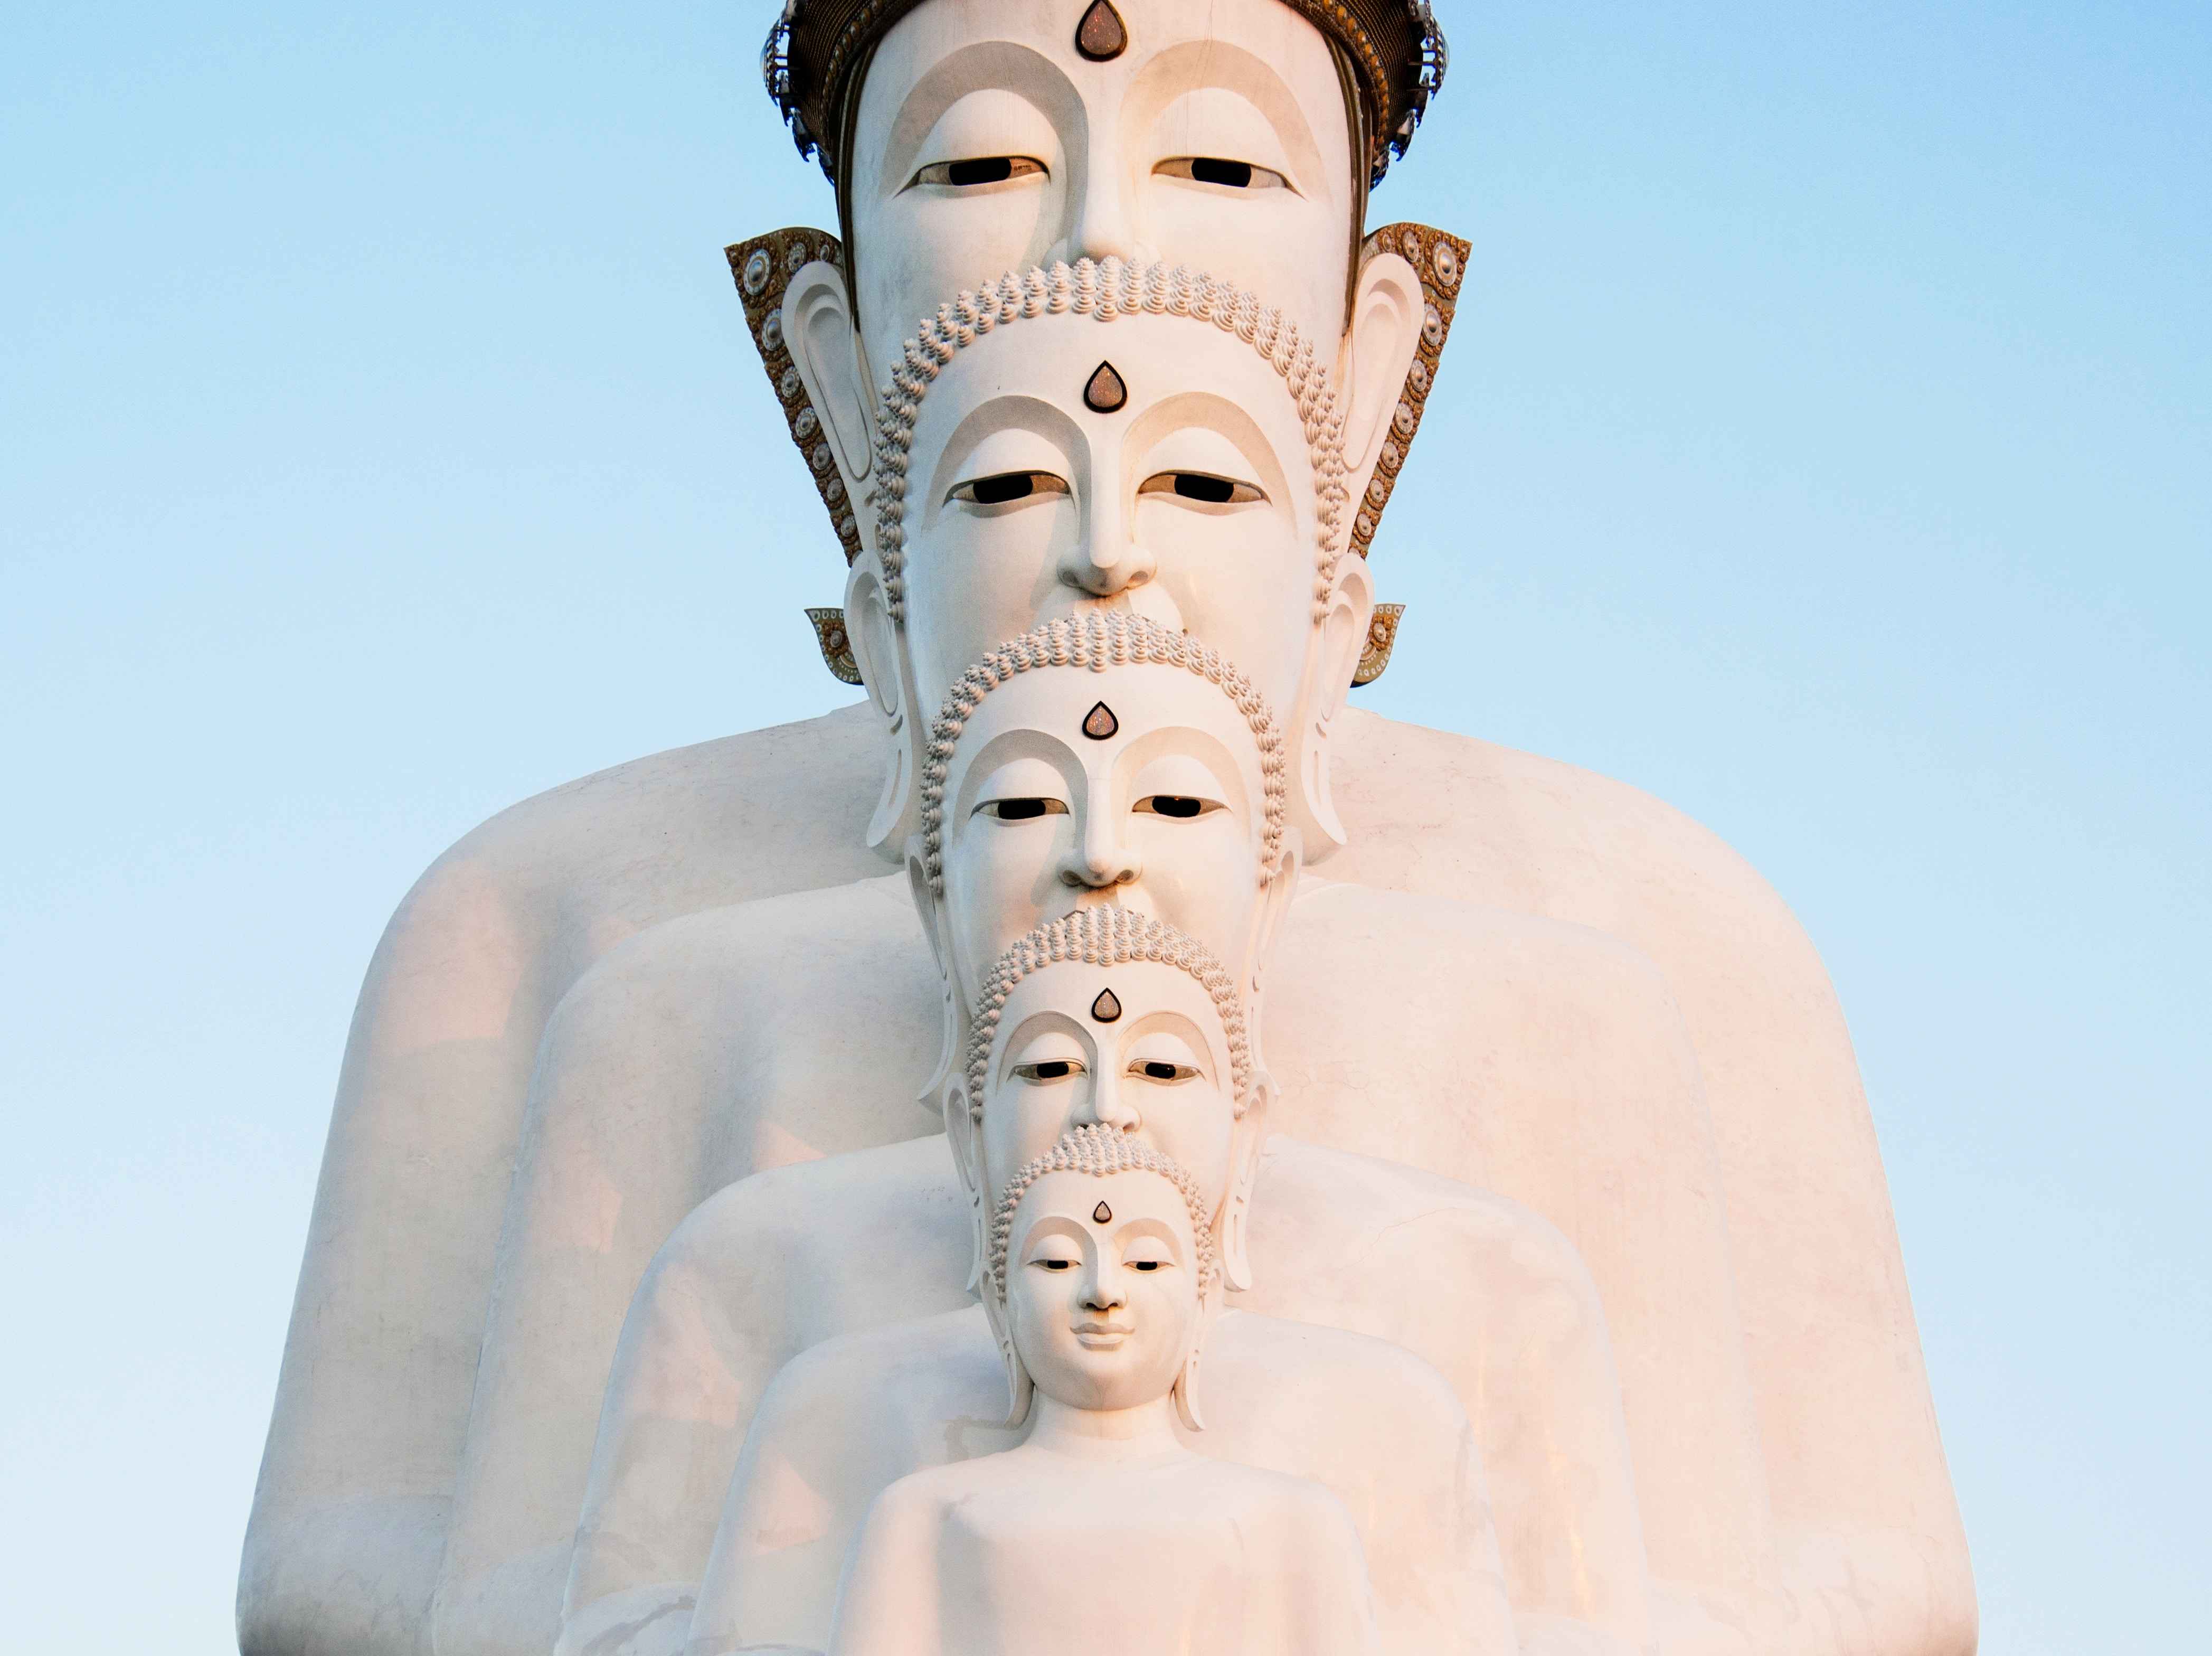 Five Buddhas at Wat Pha Sorn Kaew